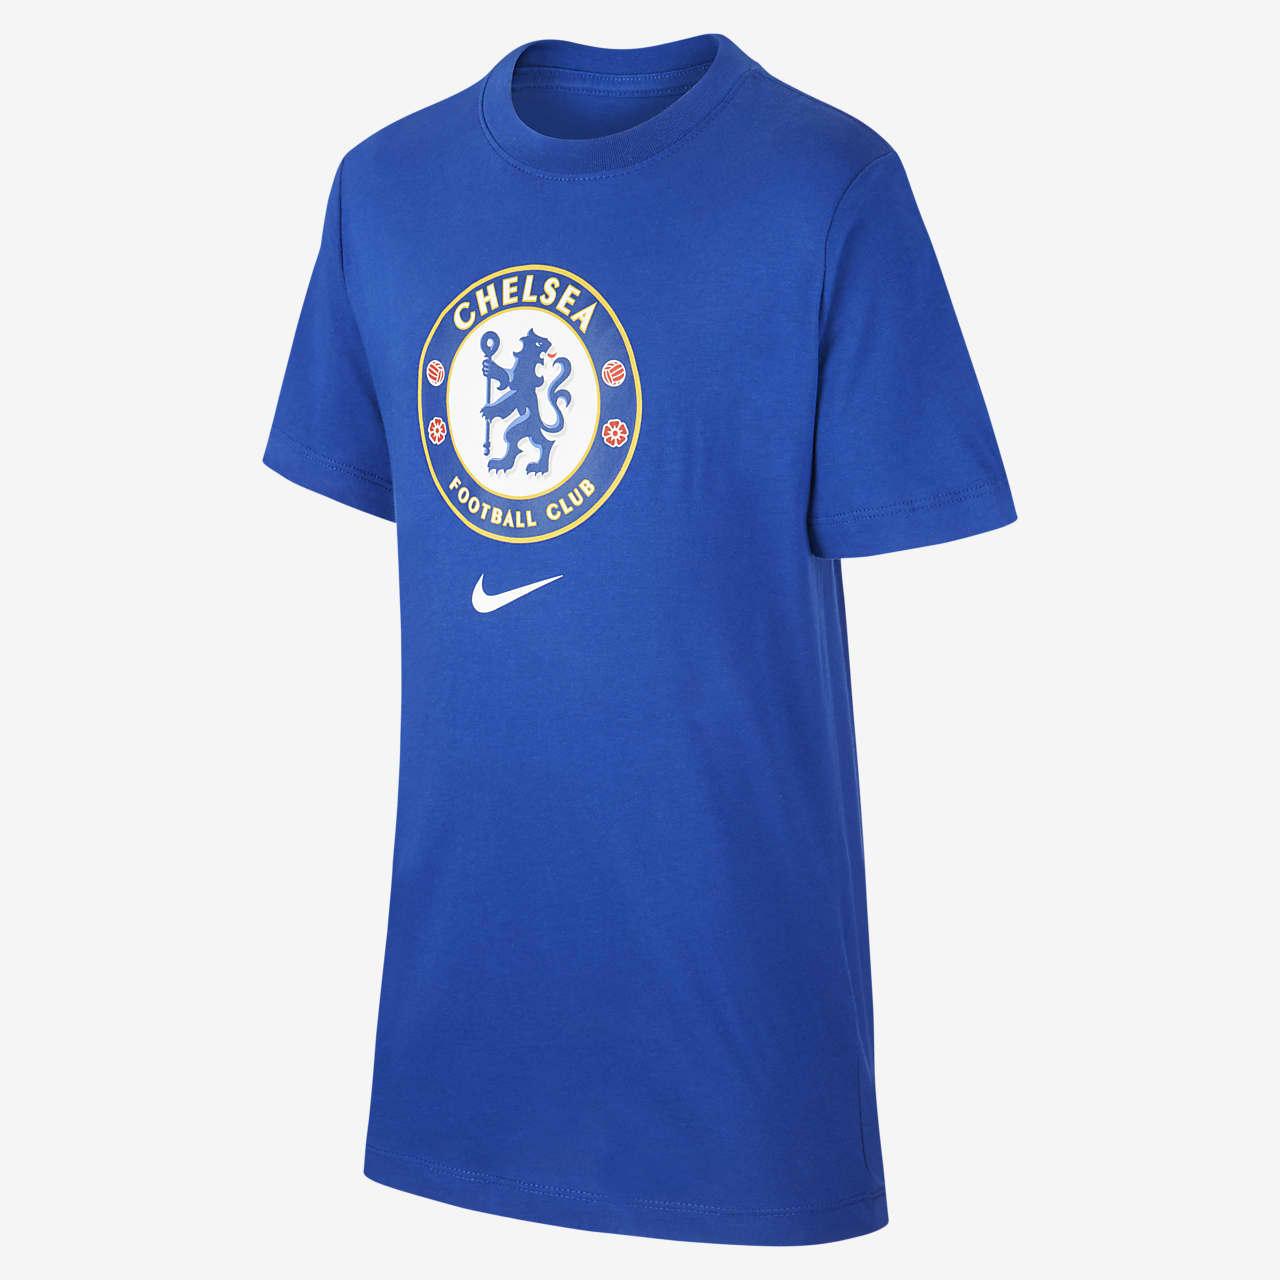 Chelsea Fc Older Kids T Shirt Nike Au